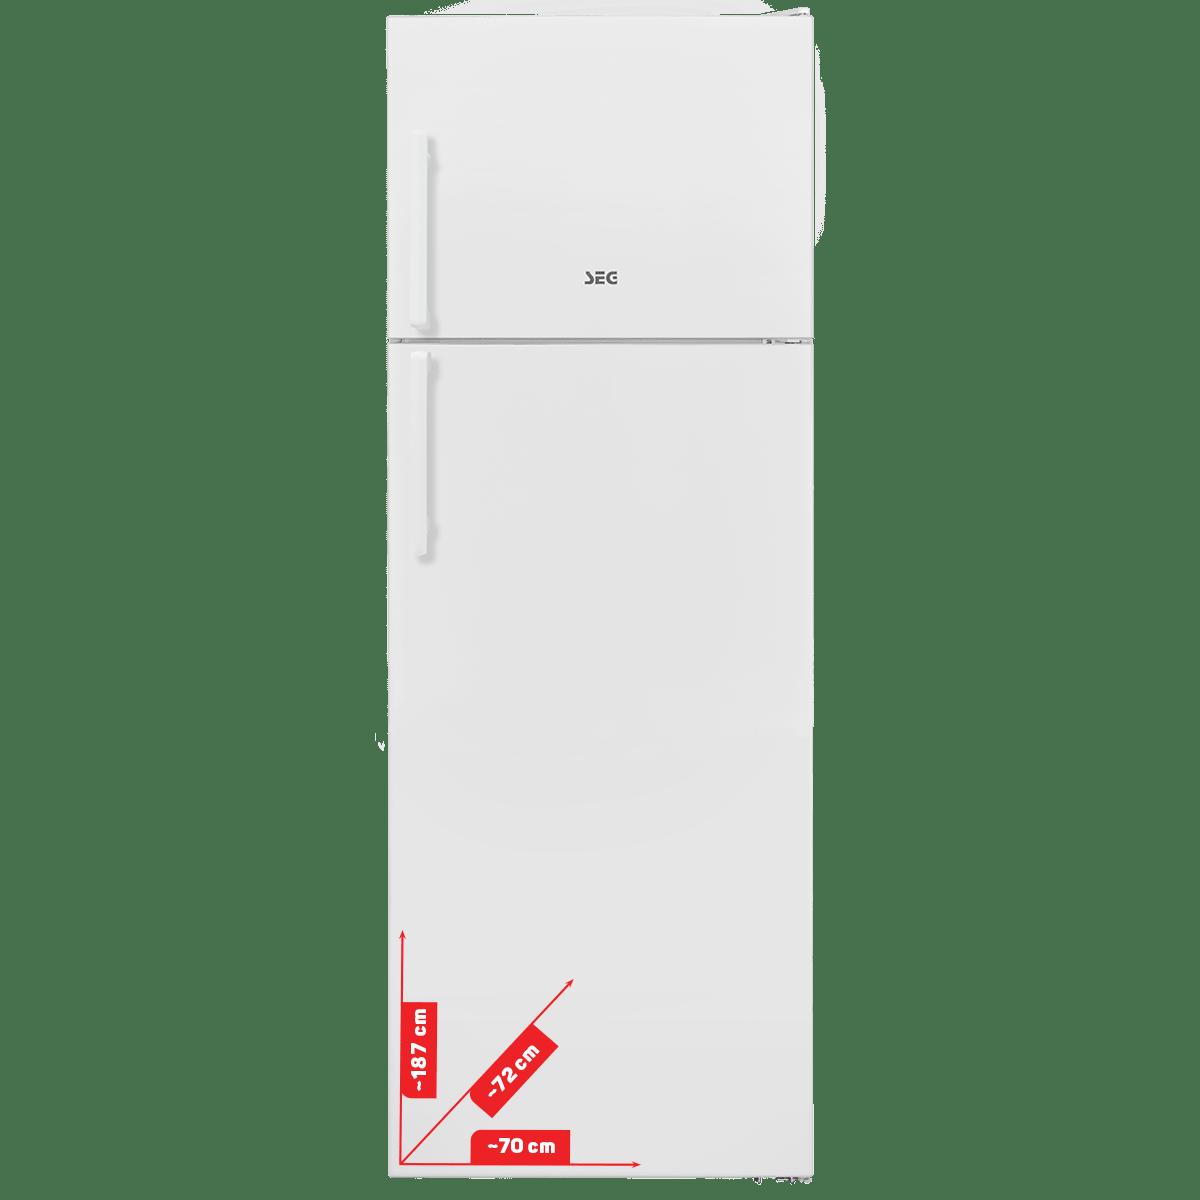 a101-seg-buzdolabi-teknosafari-min